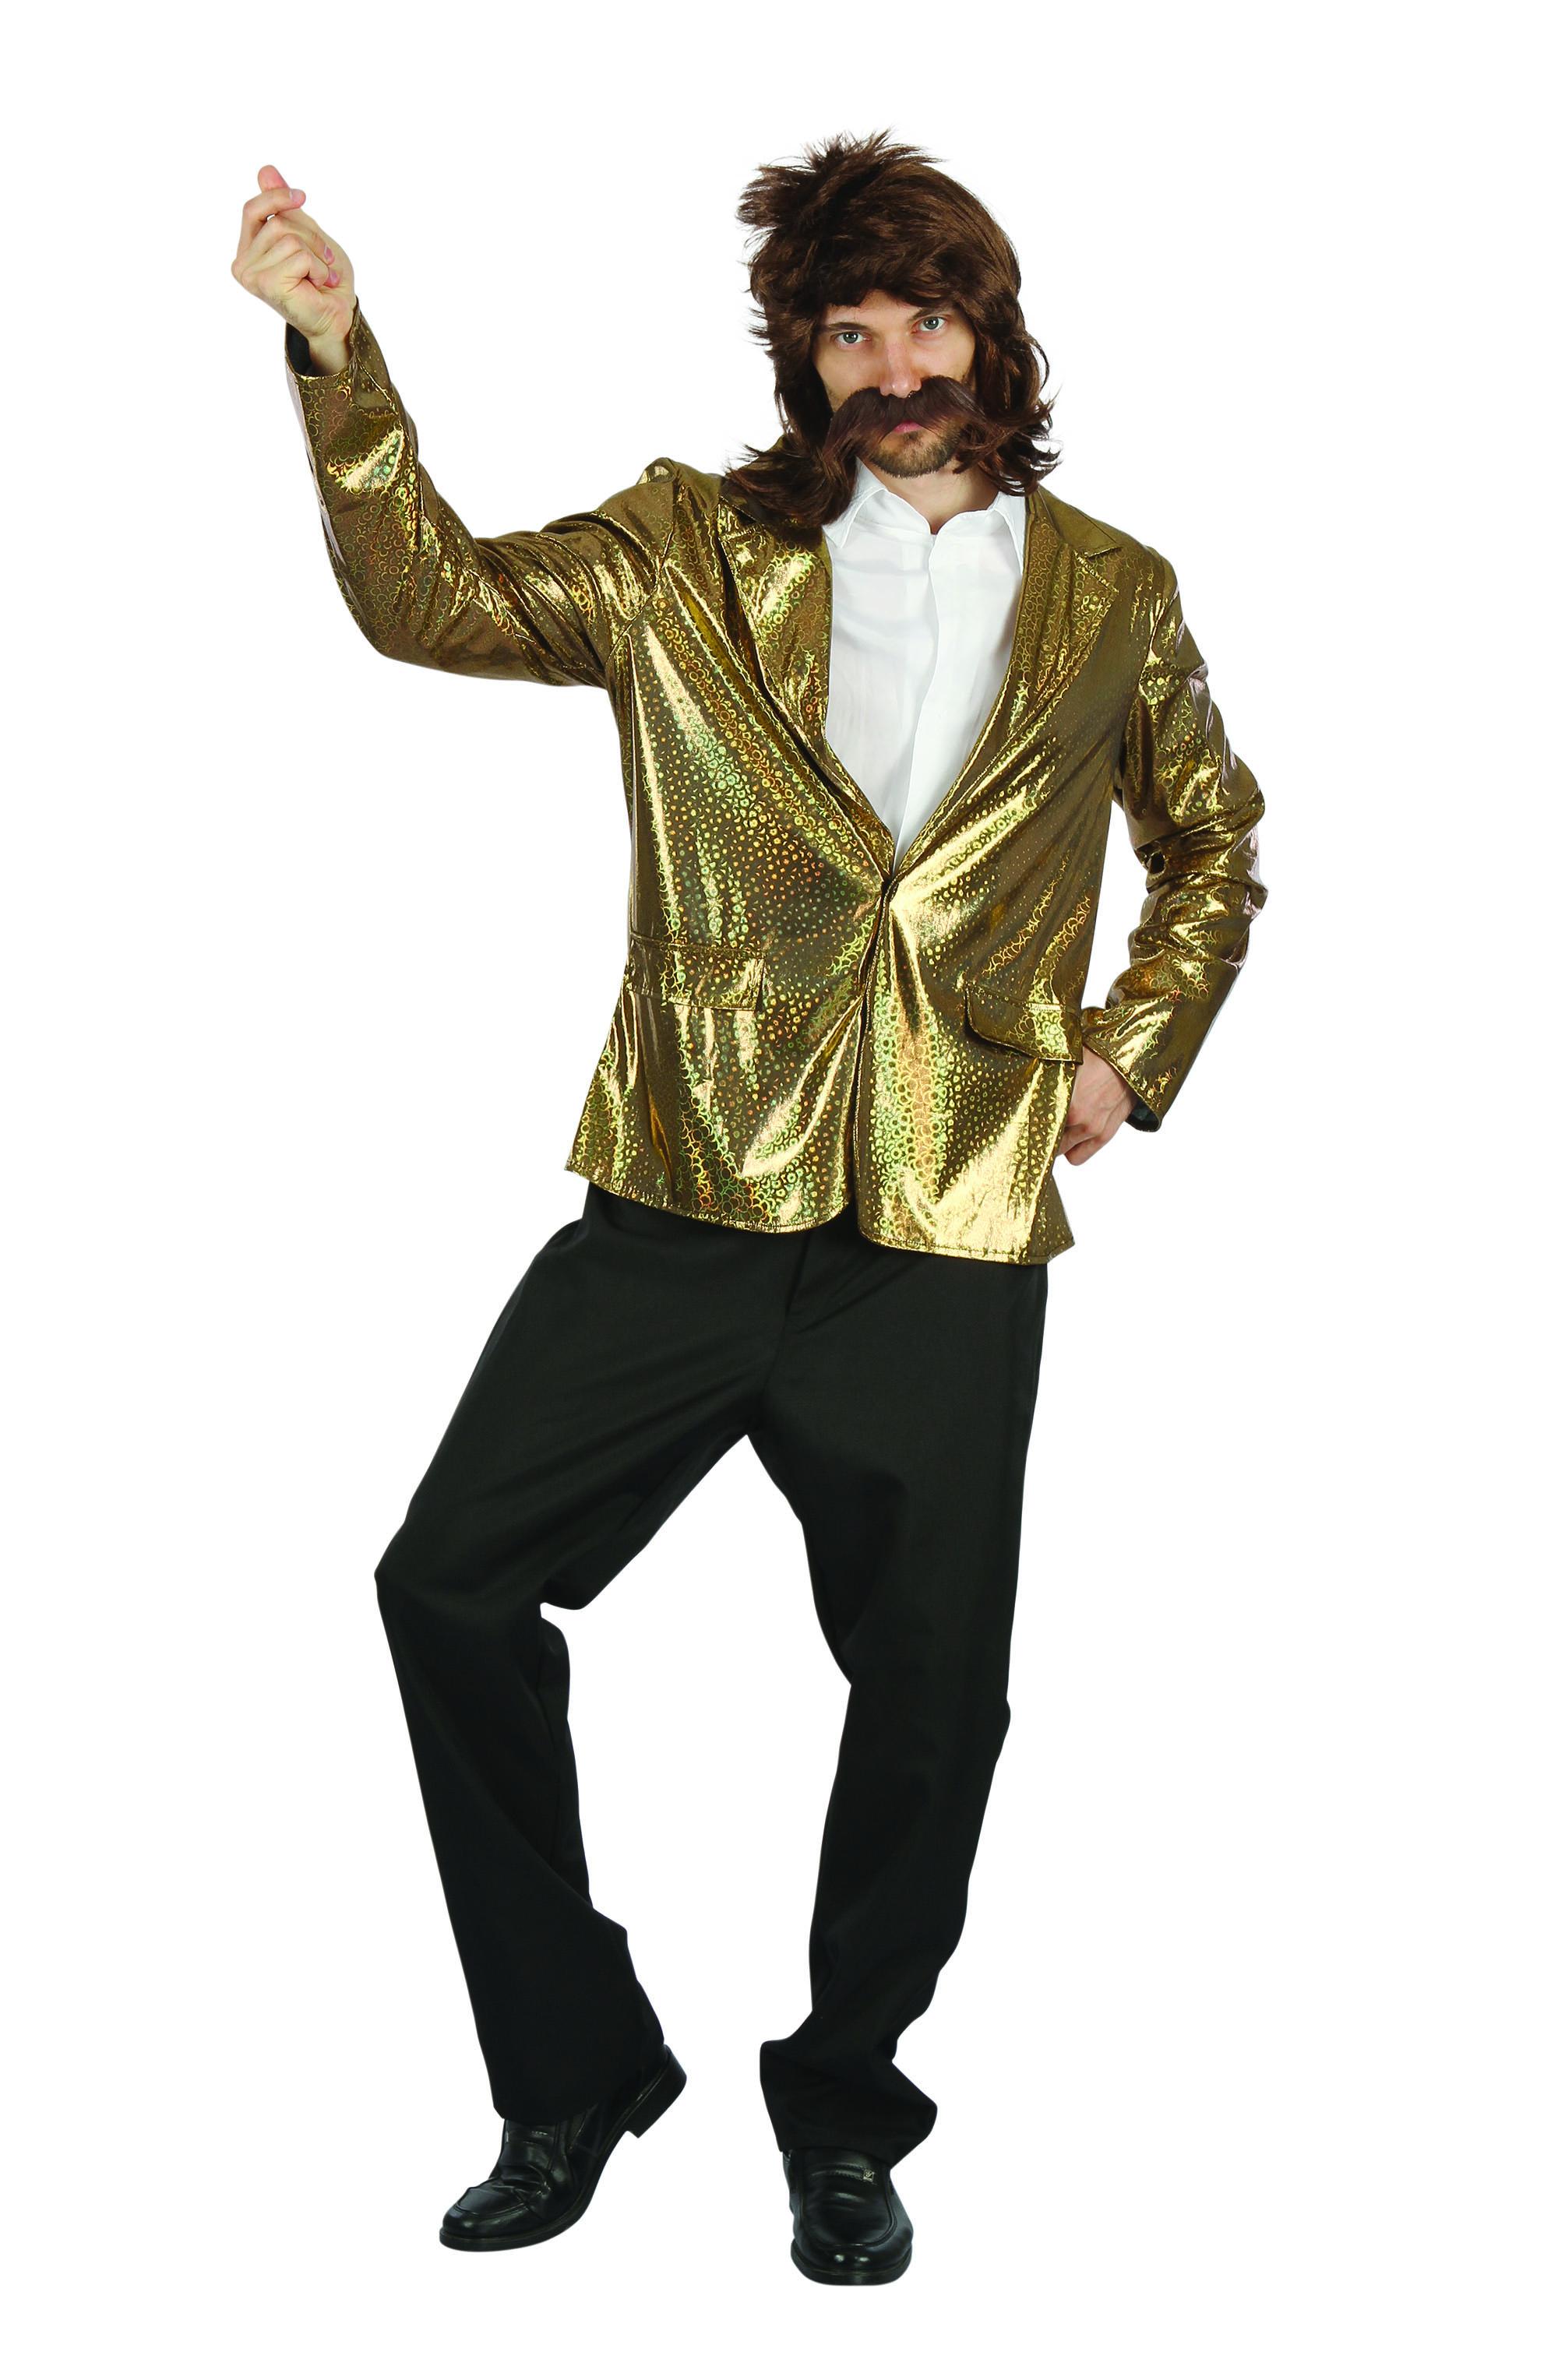 Details about Mens Gold Quiz Show Host Jacket Fancy Dress Costume Outfit  Prop Adult